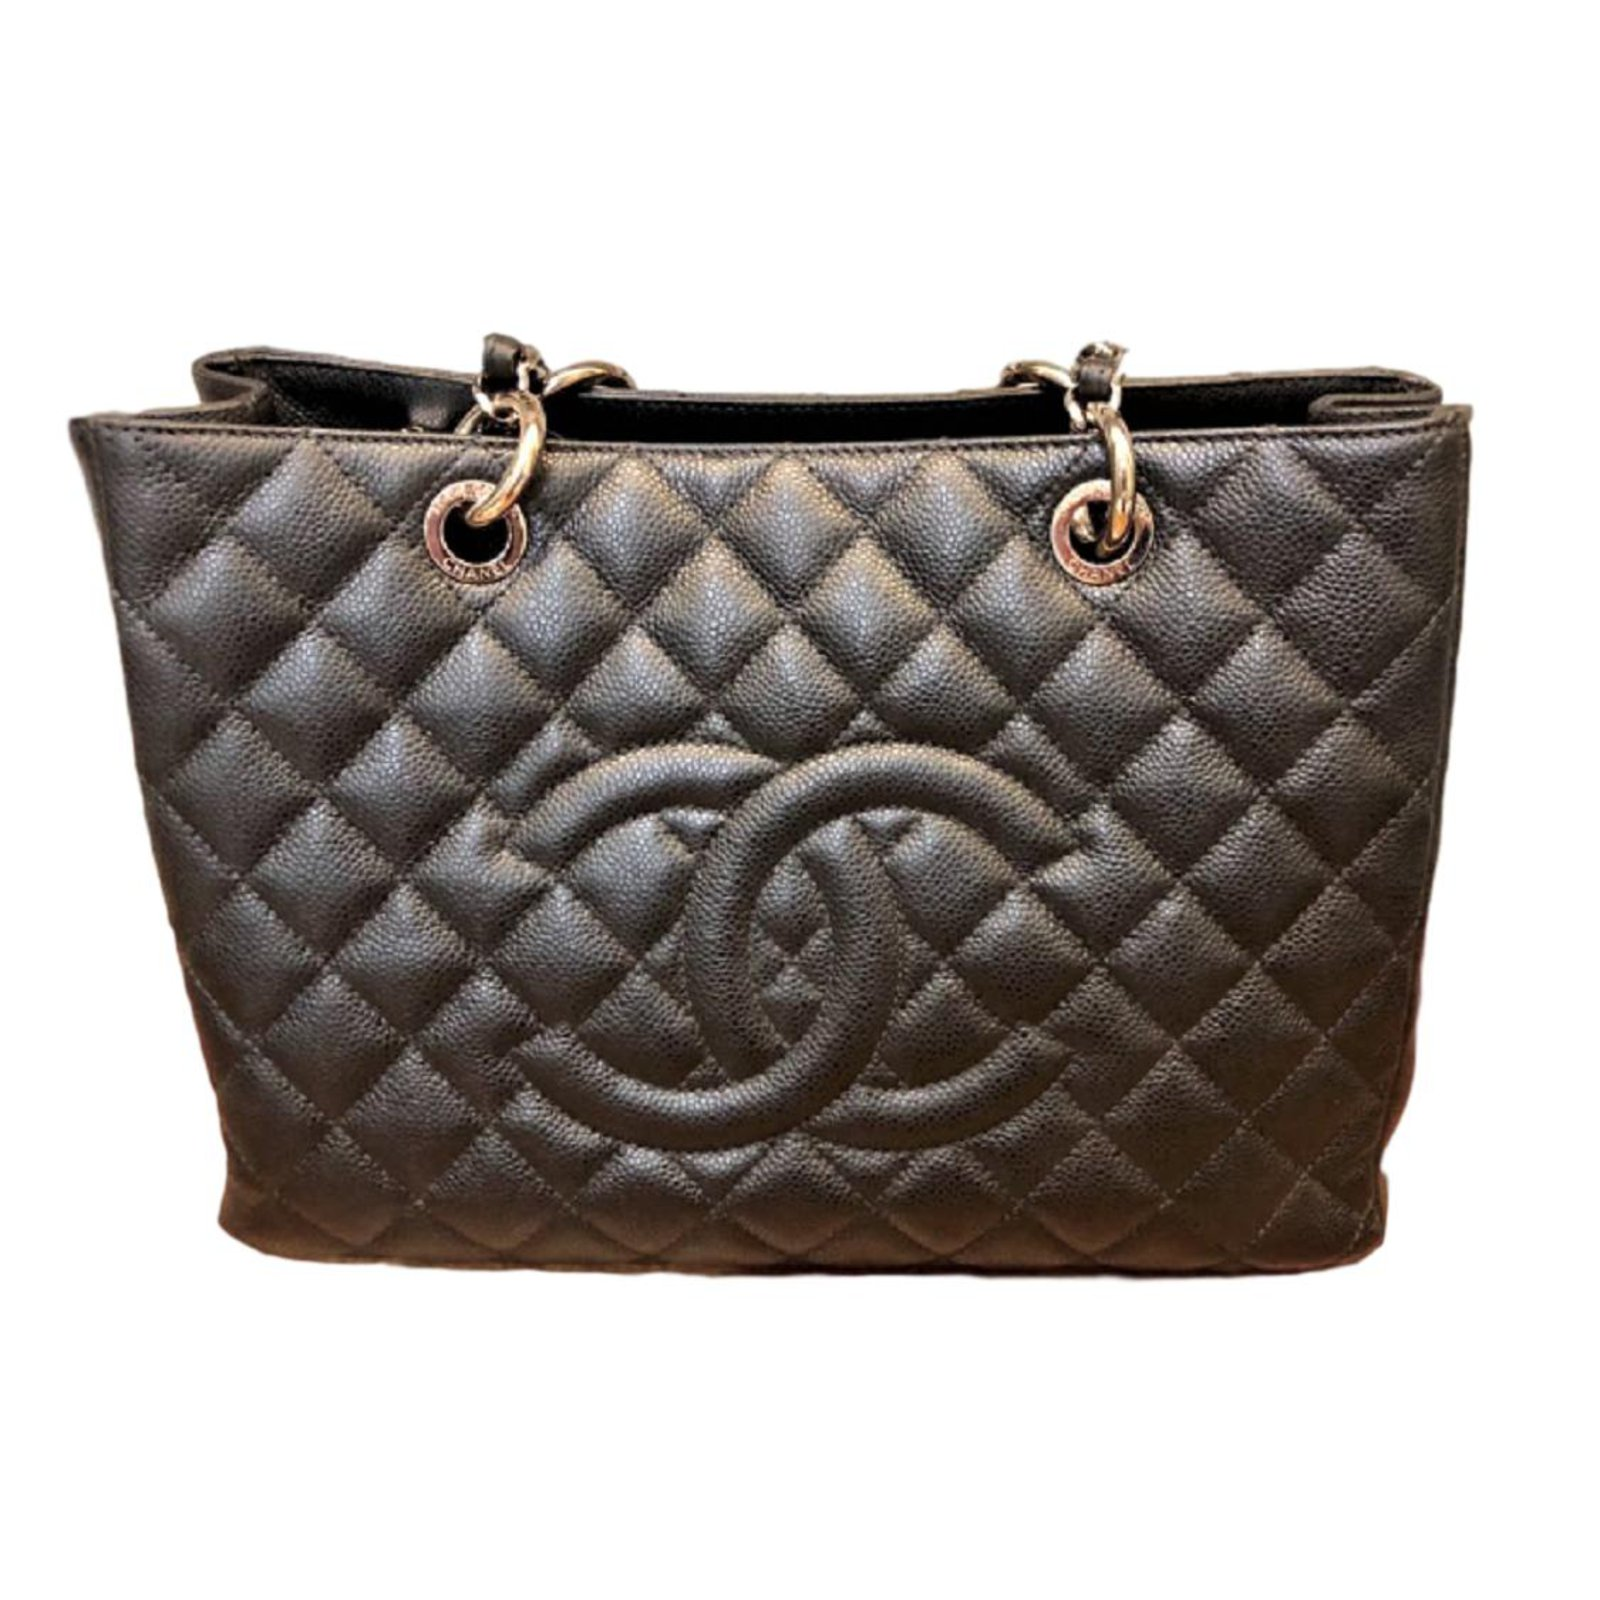 c94d4660533e Chanel GST tote bag Black Caviar Leather Totes Leather Black ref.79754